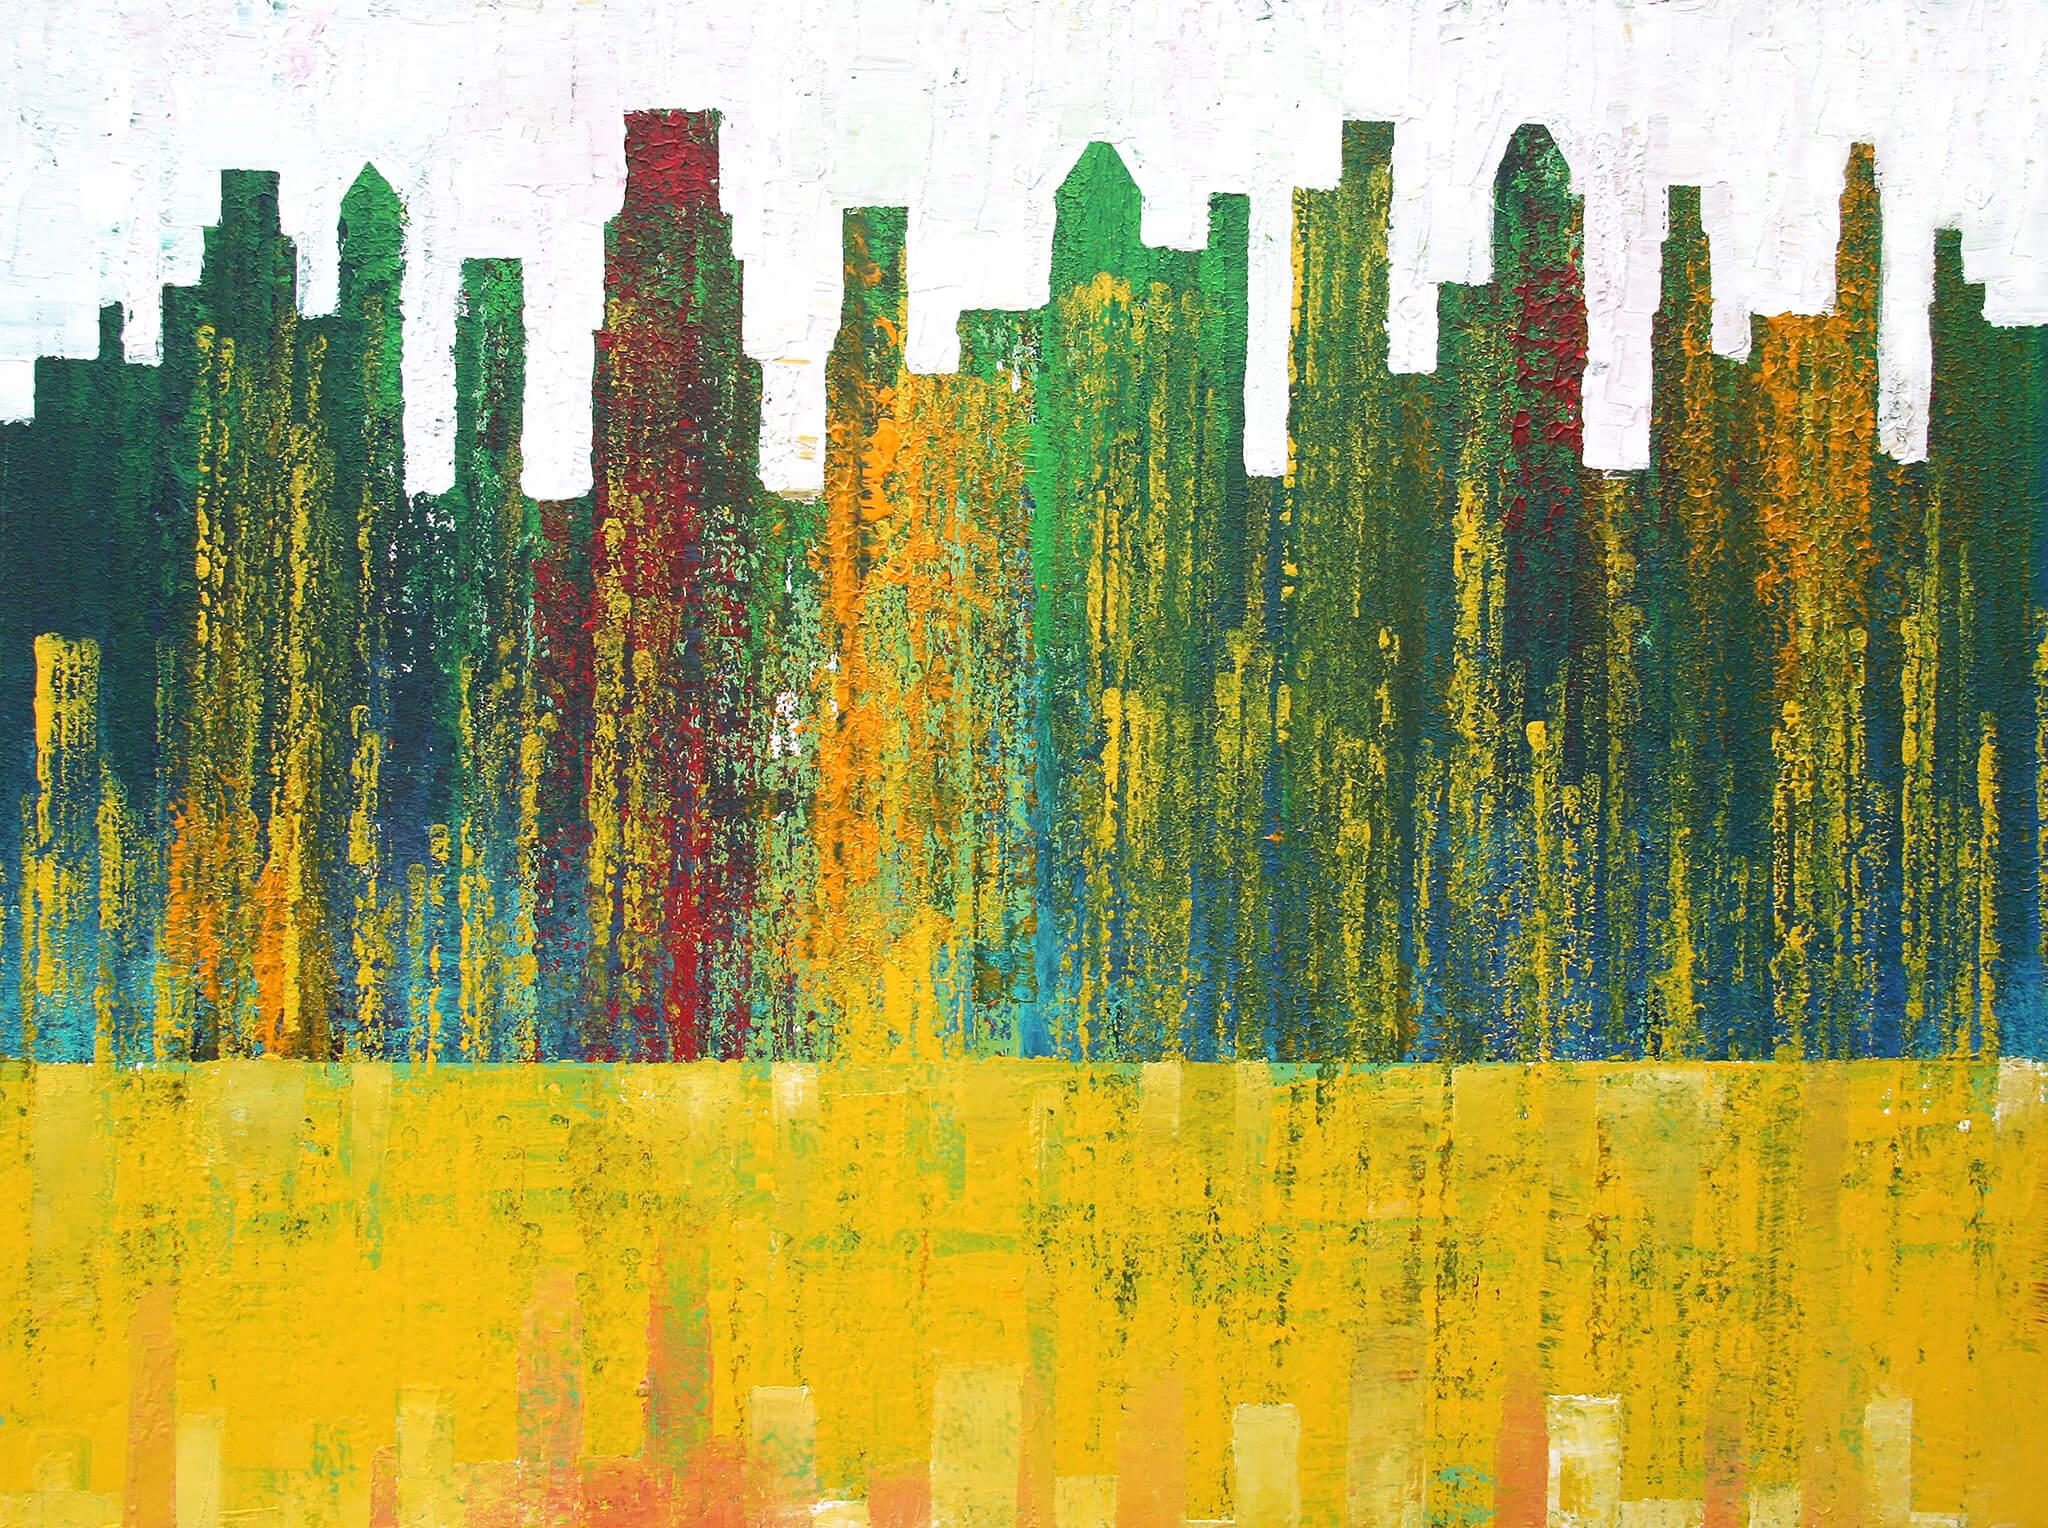 City and no city